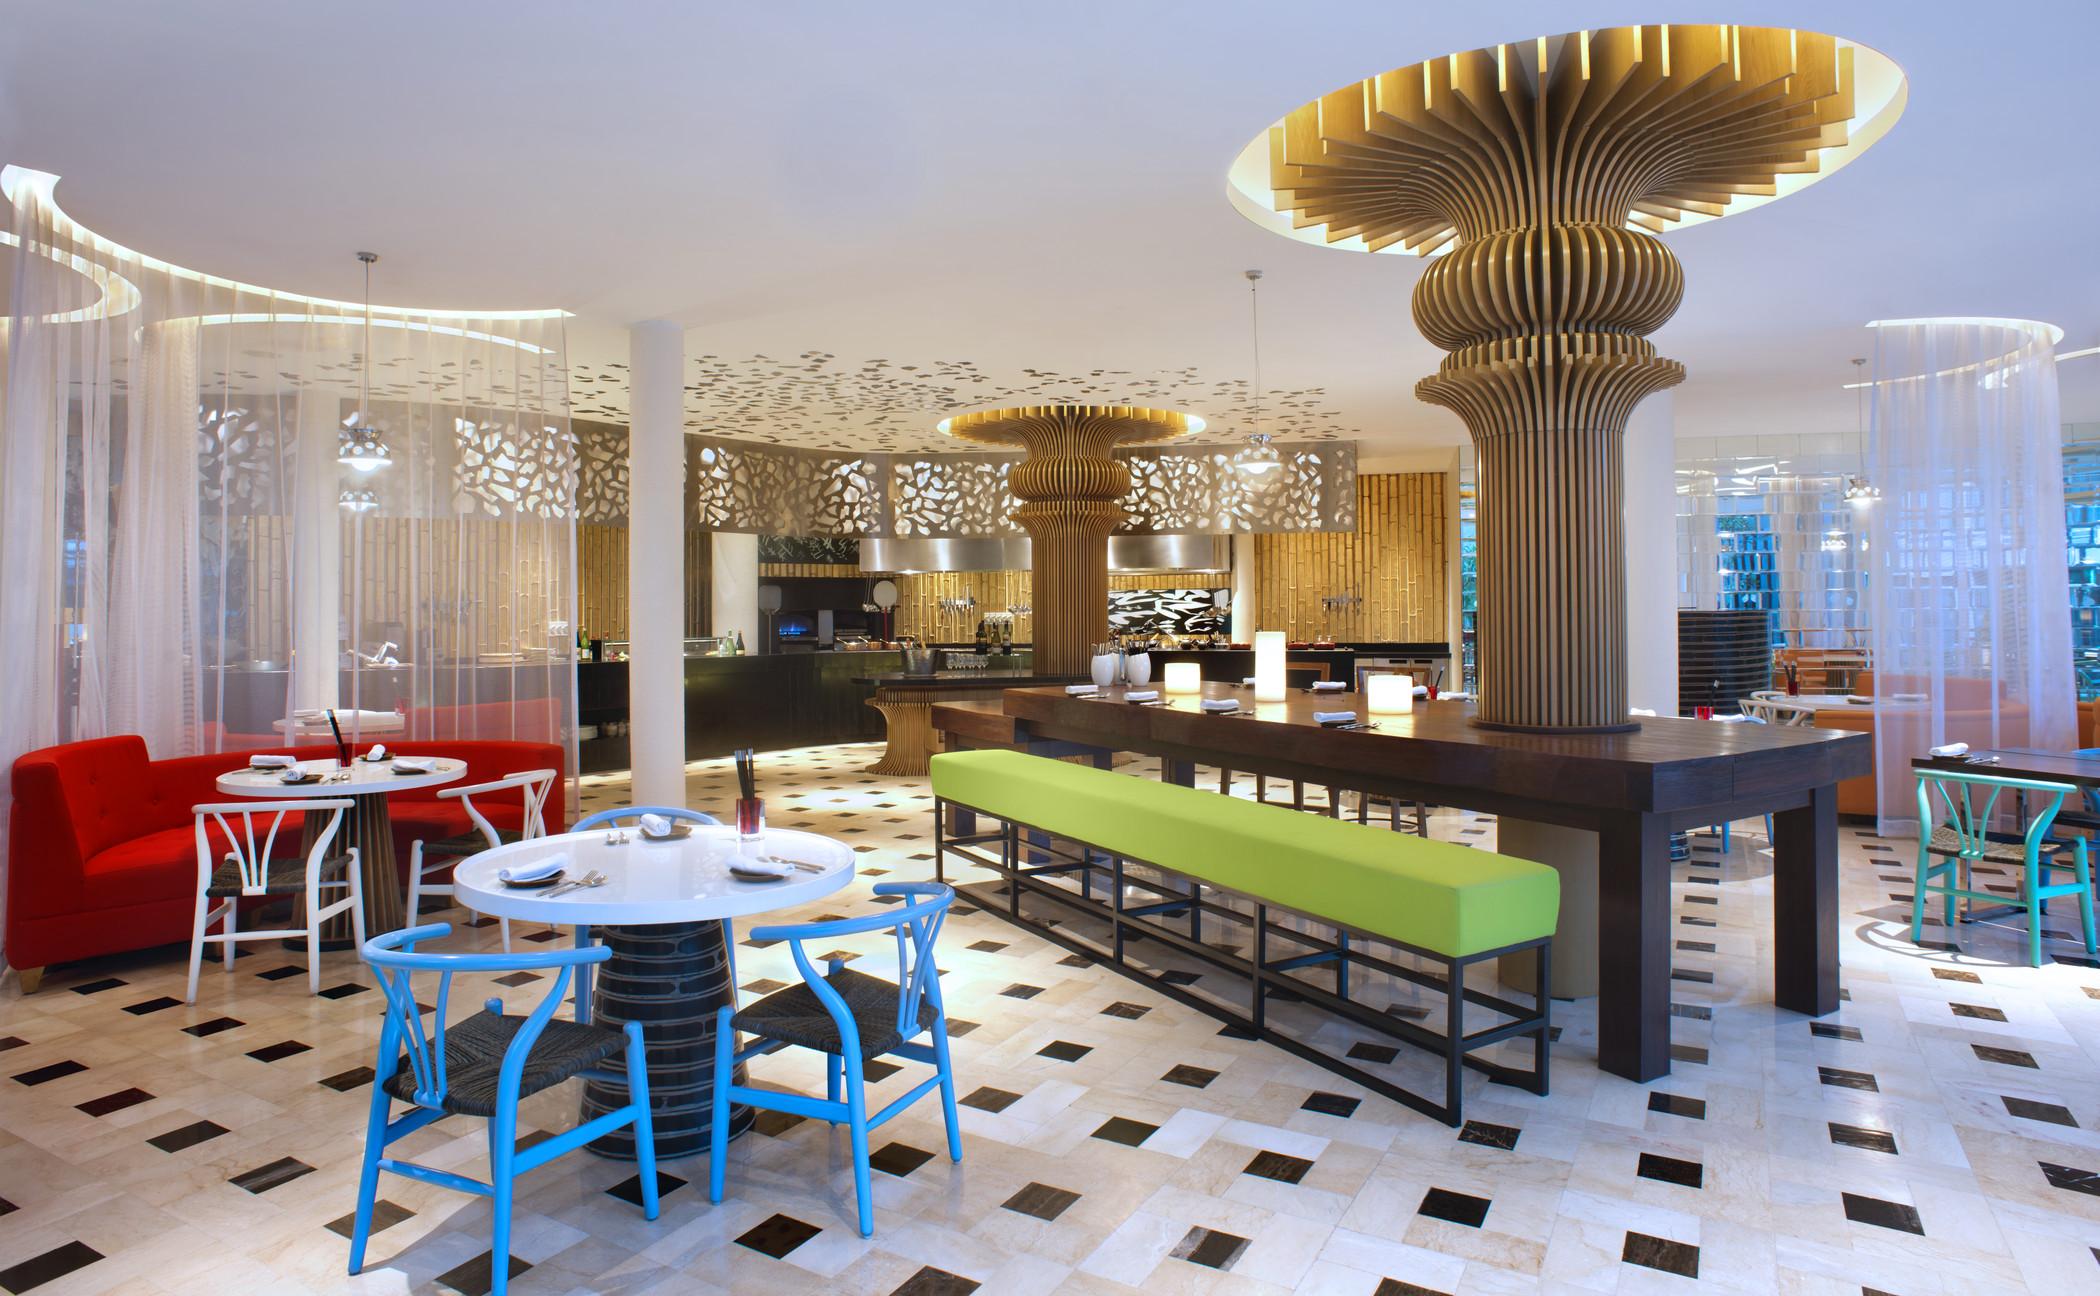 Restoran Bamboo Chic tempat perhelatan sesi makan malam spesial.